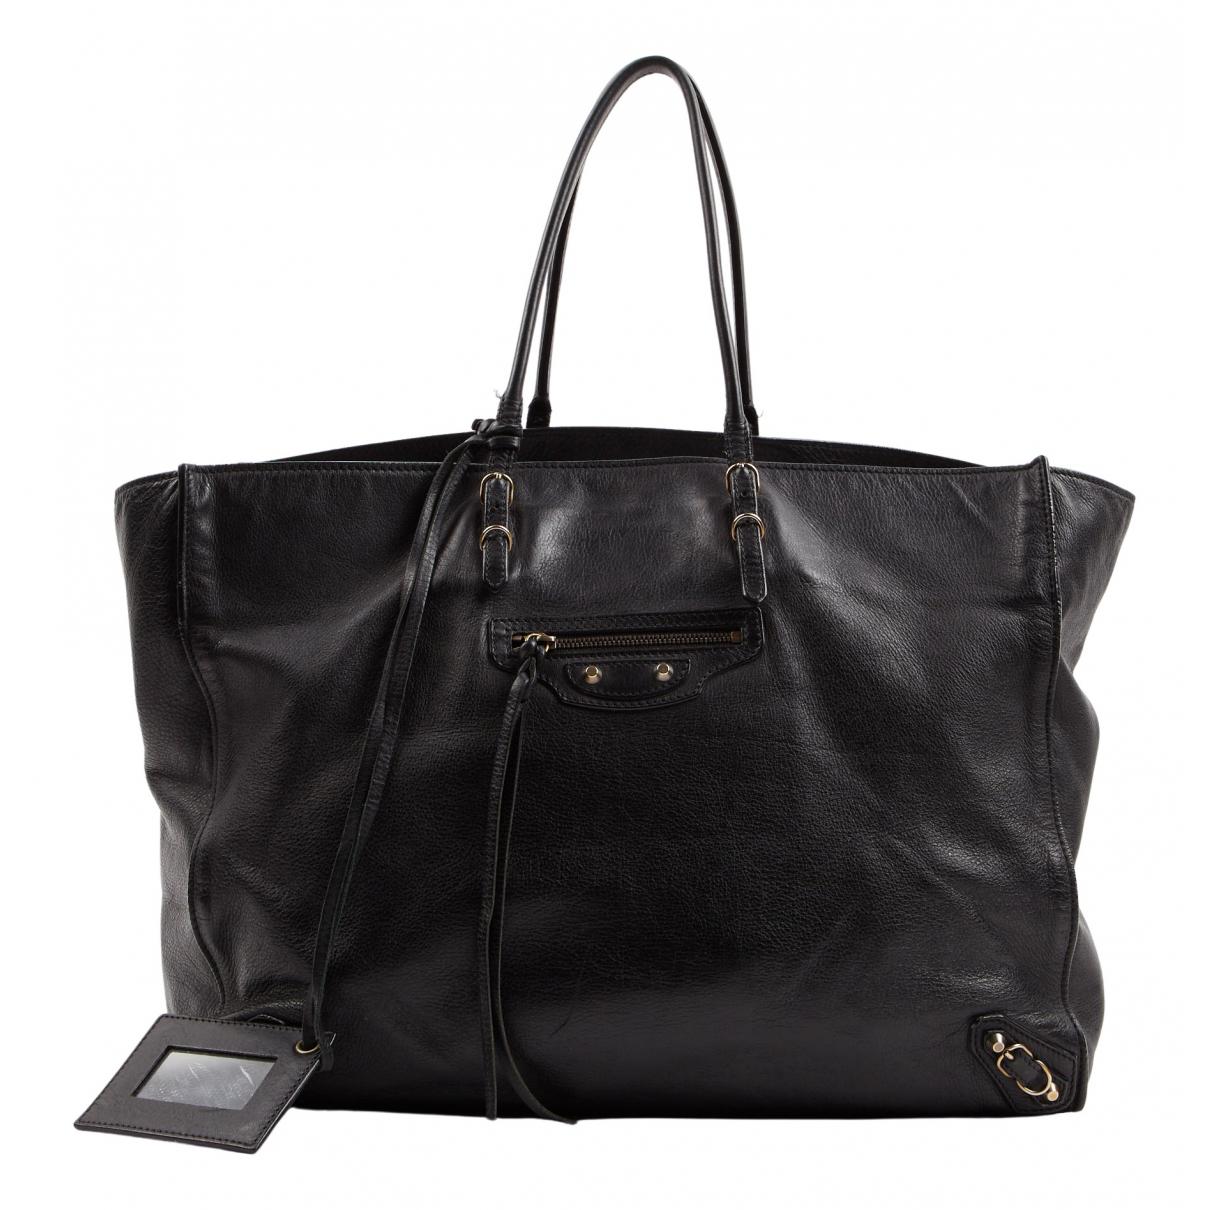 Balenciaga Papier Black Leather handbag for Women \N